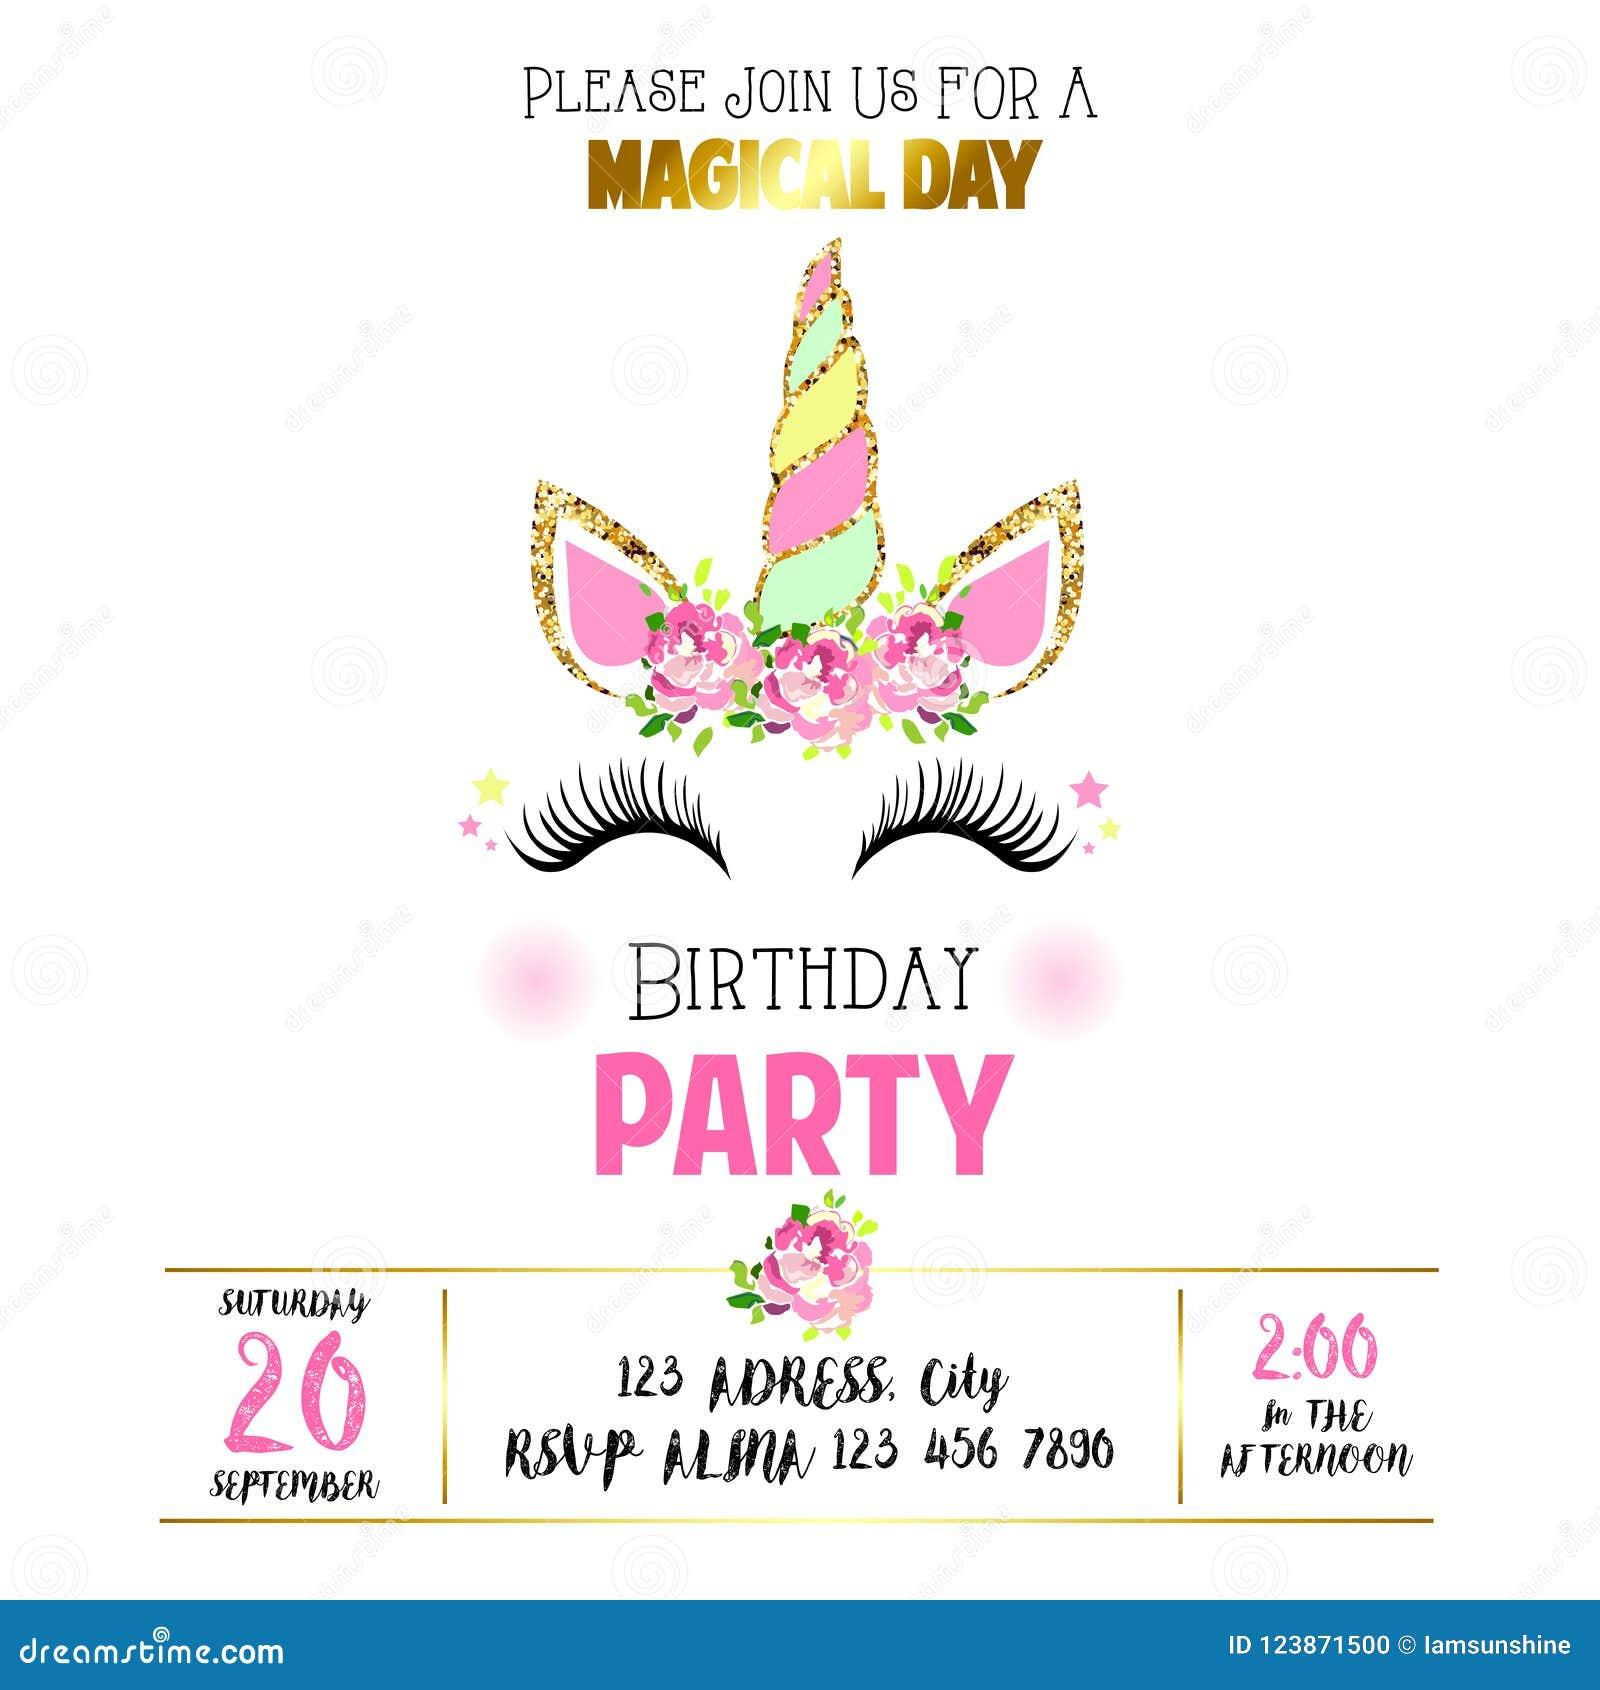 Cute Birthday invitation with unicorn